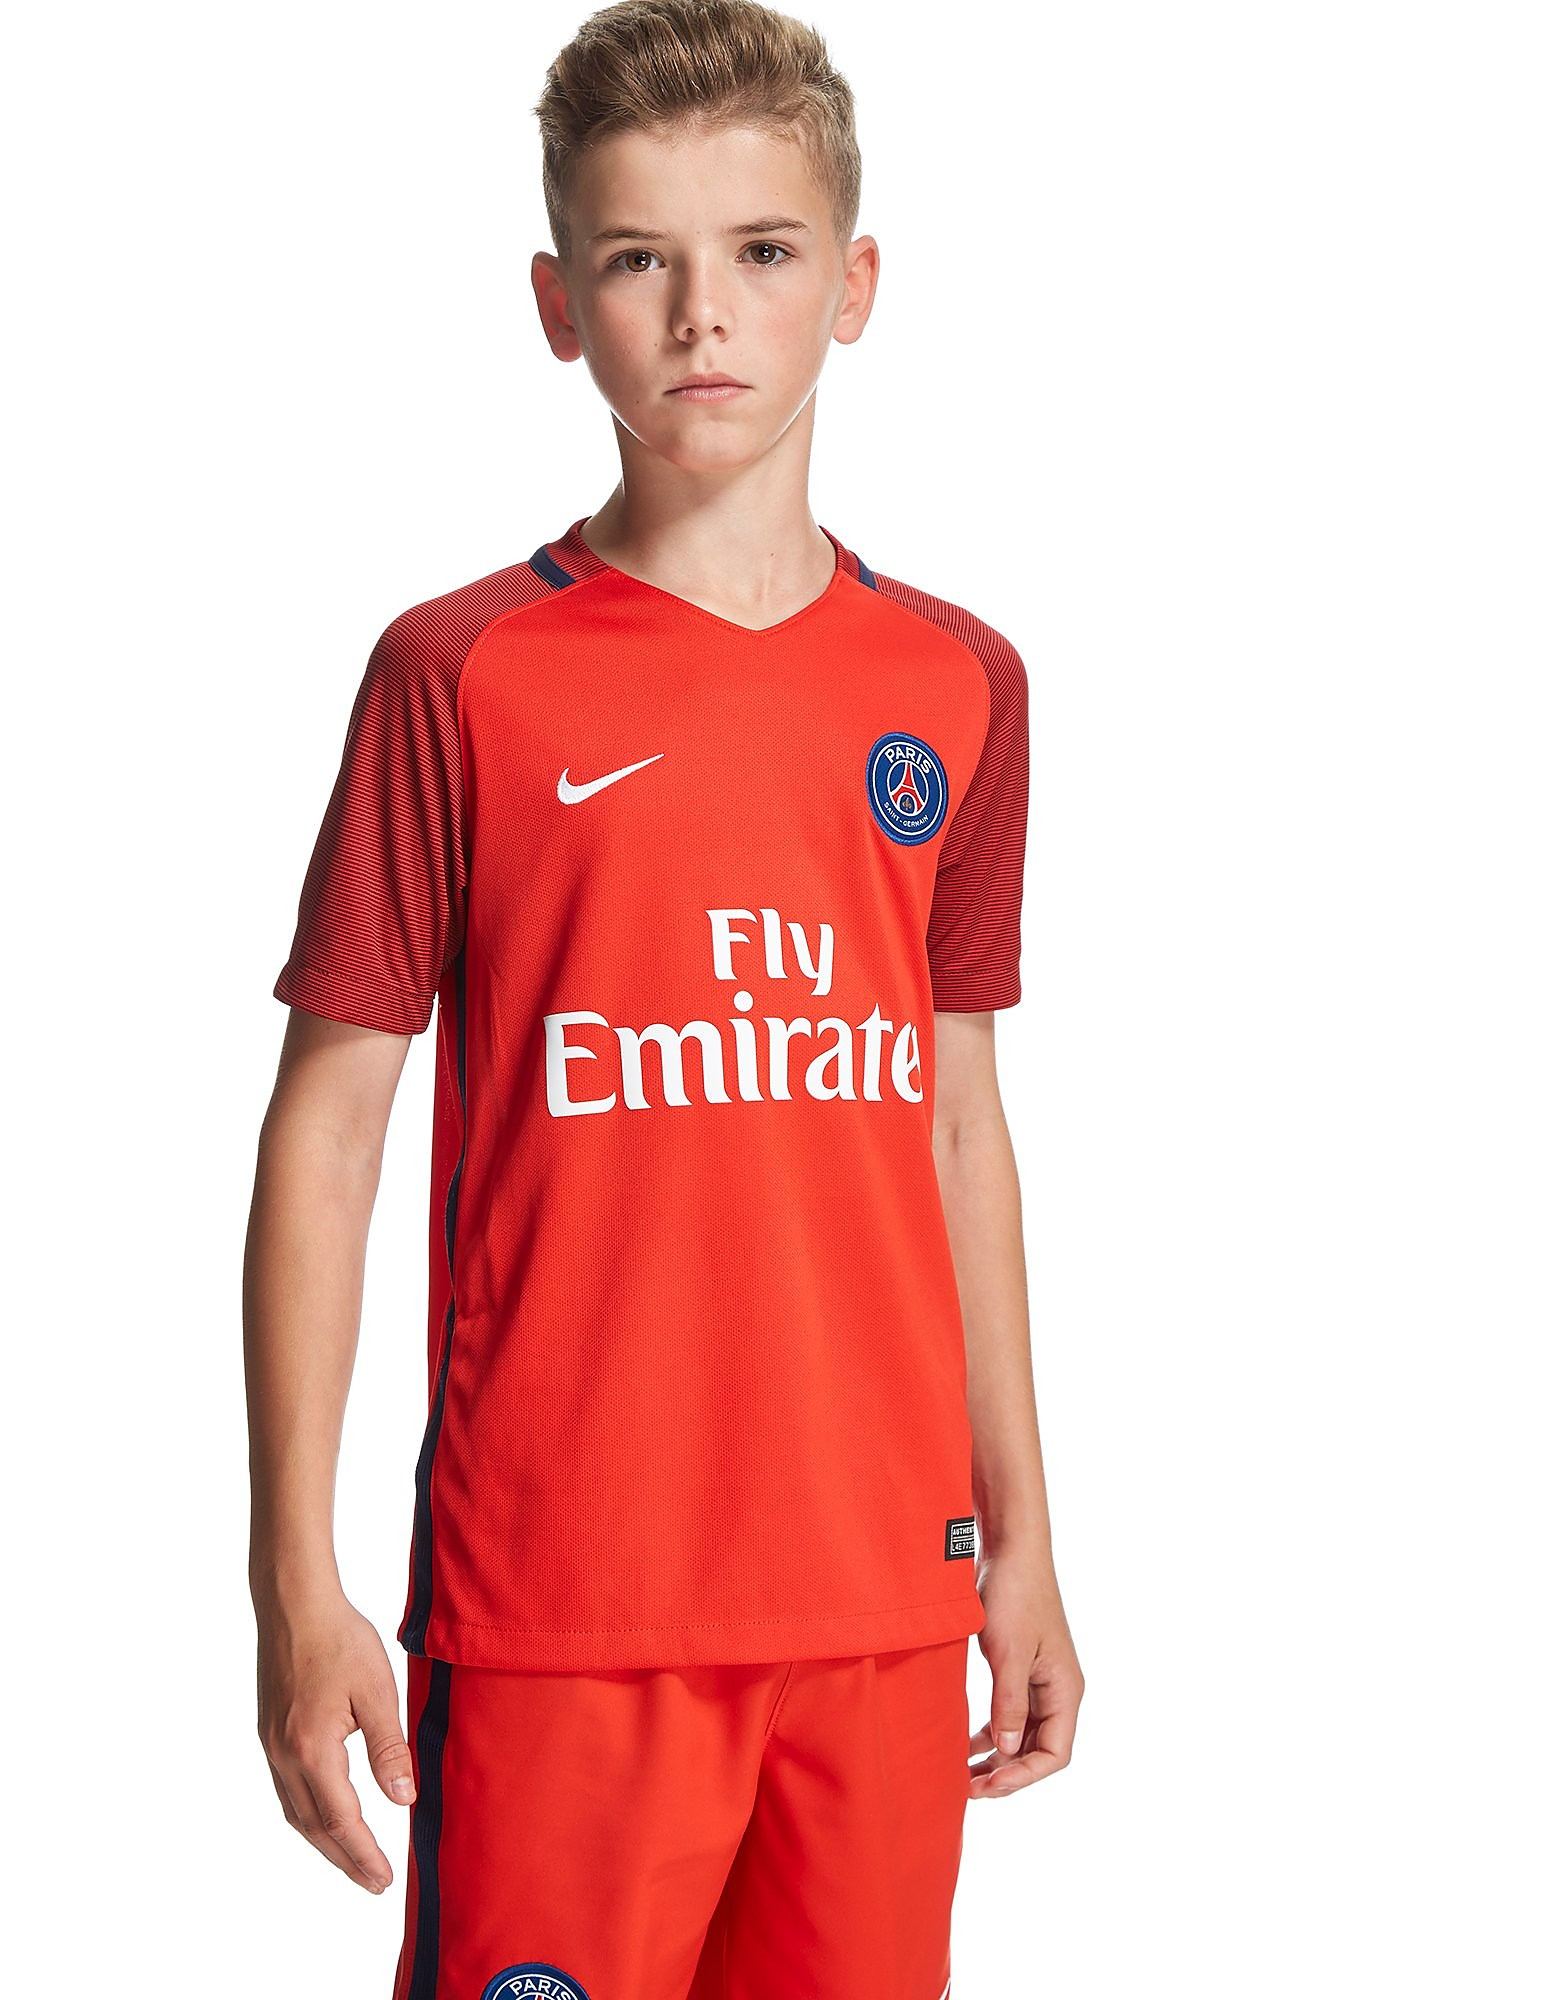 Nike Paris Saint Germain 2016/17 Away Shirt Junior